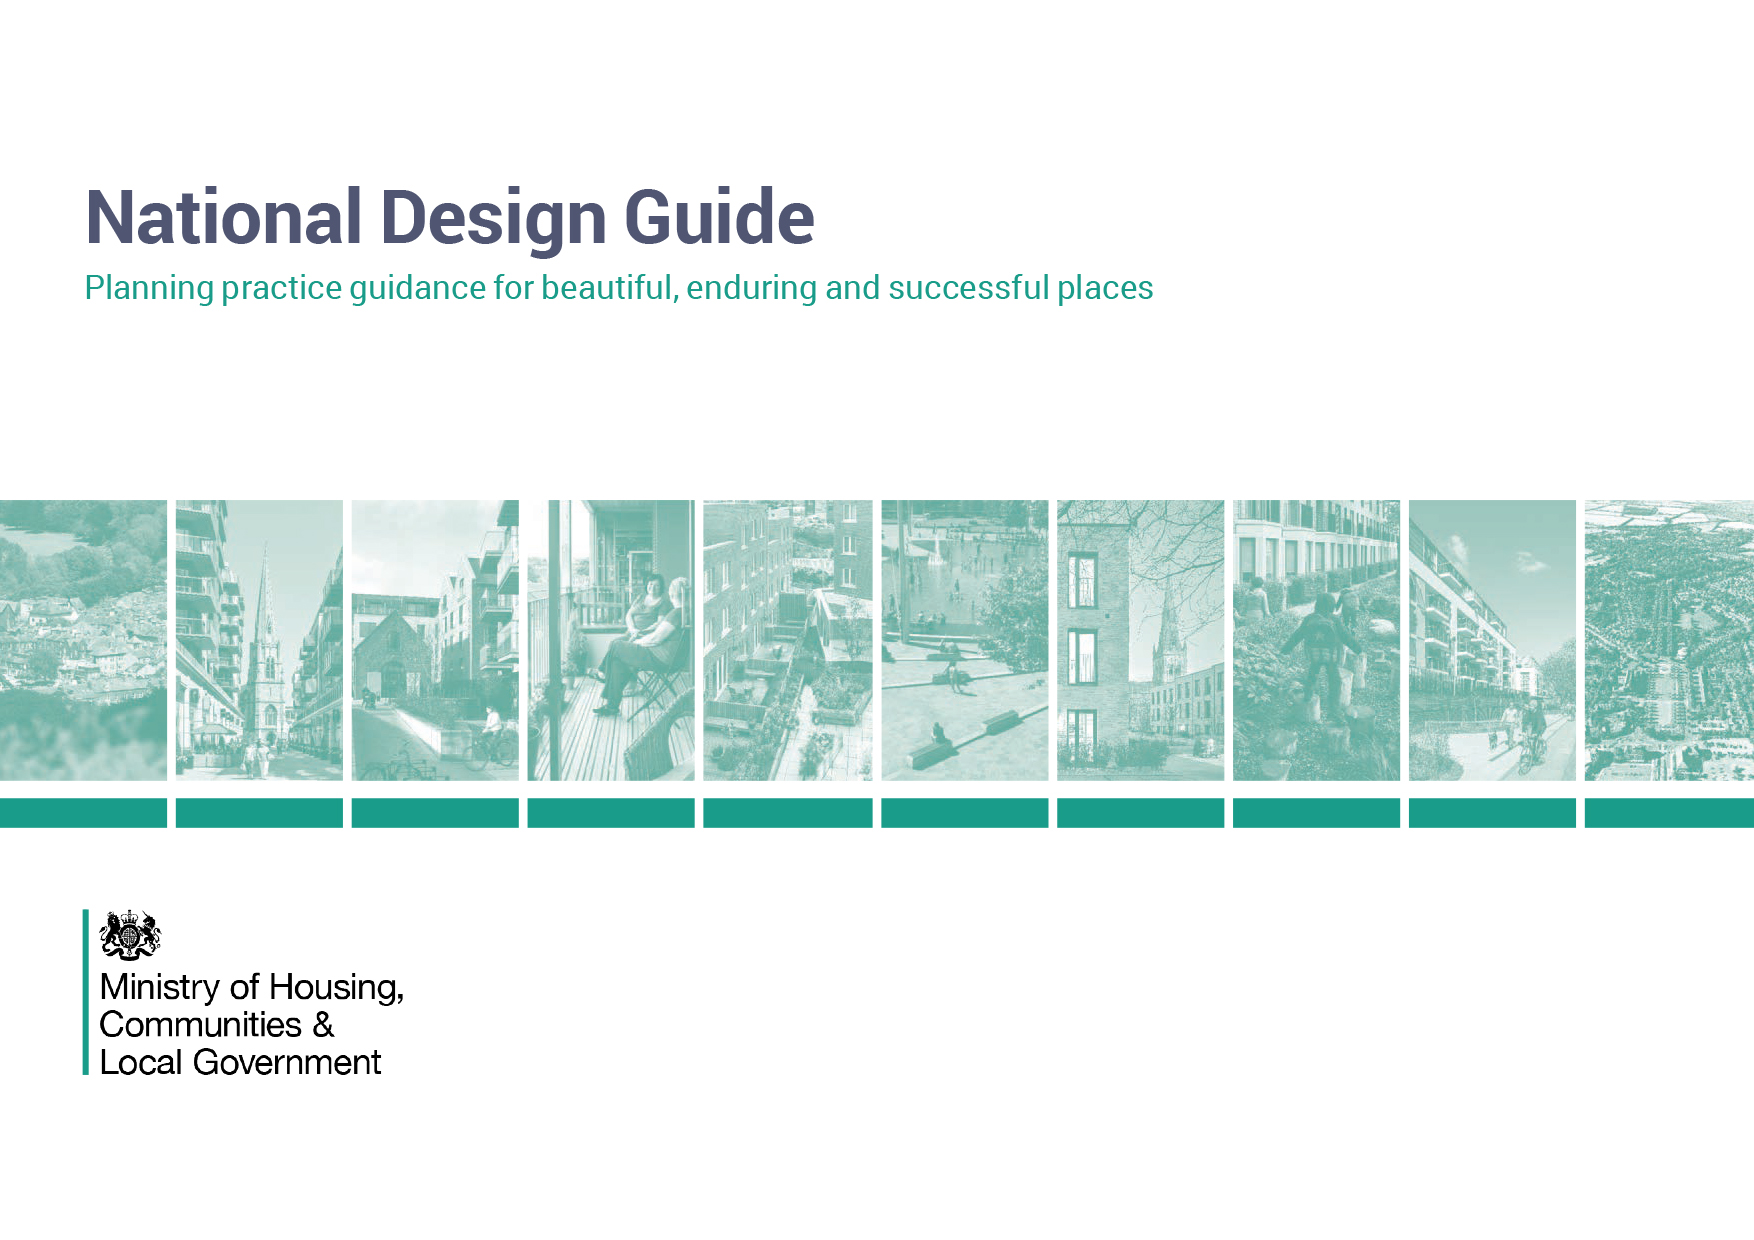 National Design Guide